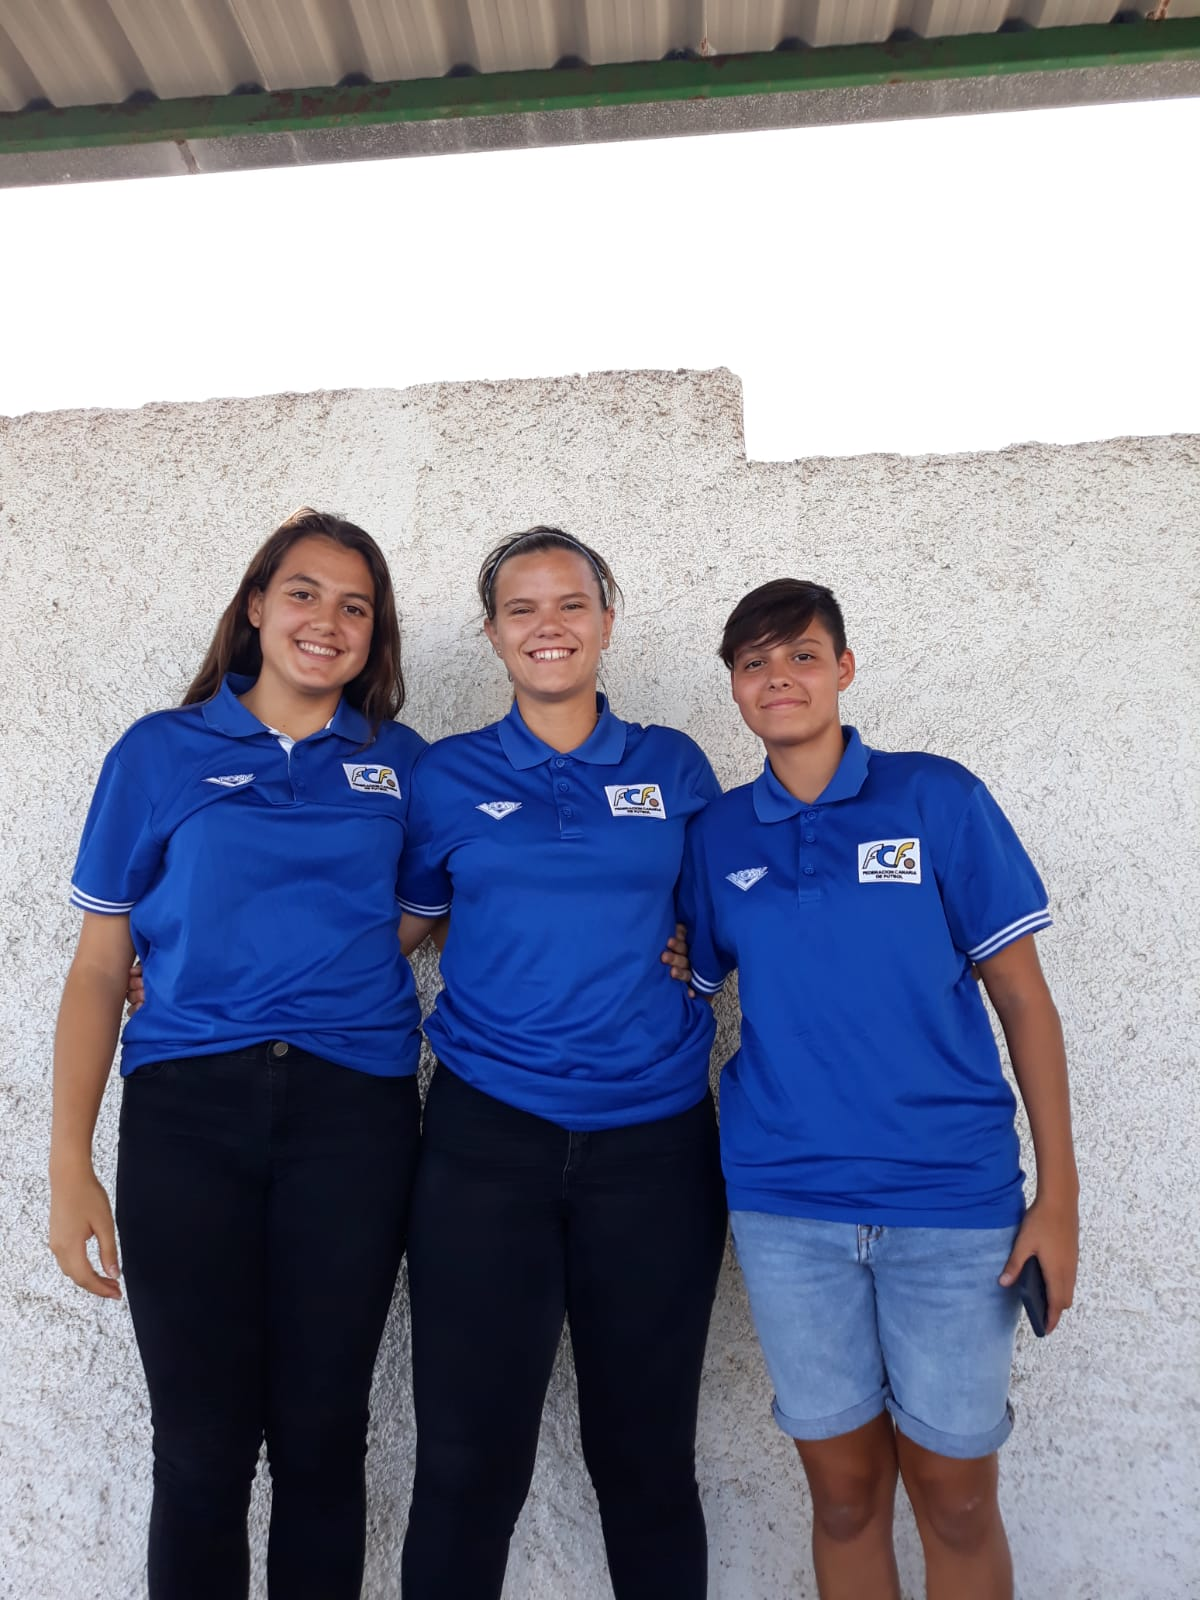 De Izquierda a derecha: Paola Olivera Rodríguez, Evelyn Bolaños Durán y Mirian Pérez Guzmán